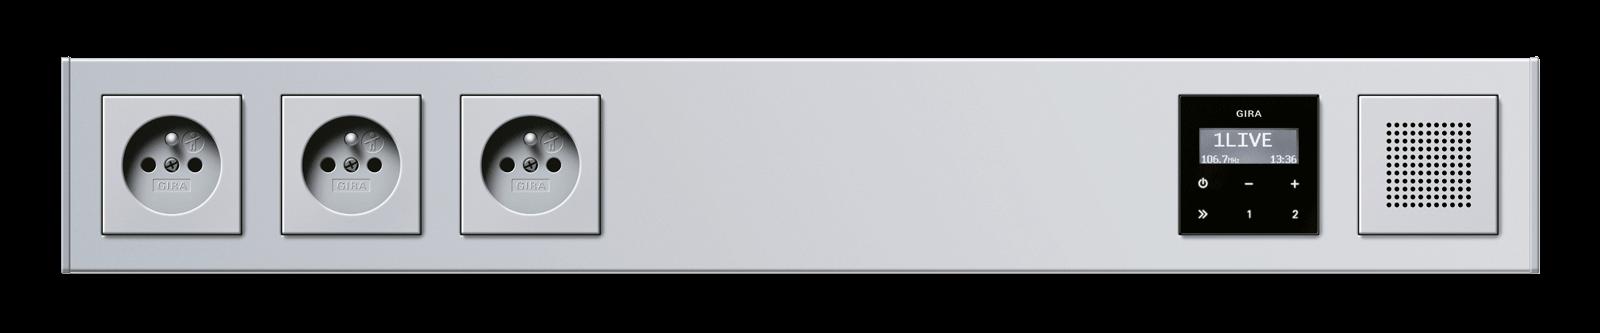 Gira Produkt Profil55 frontal